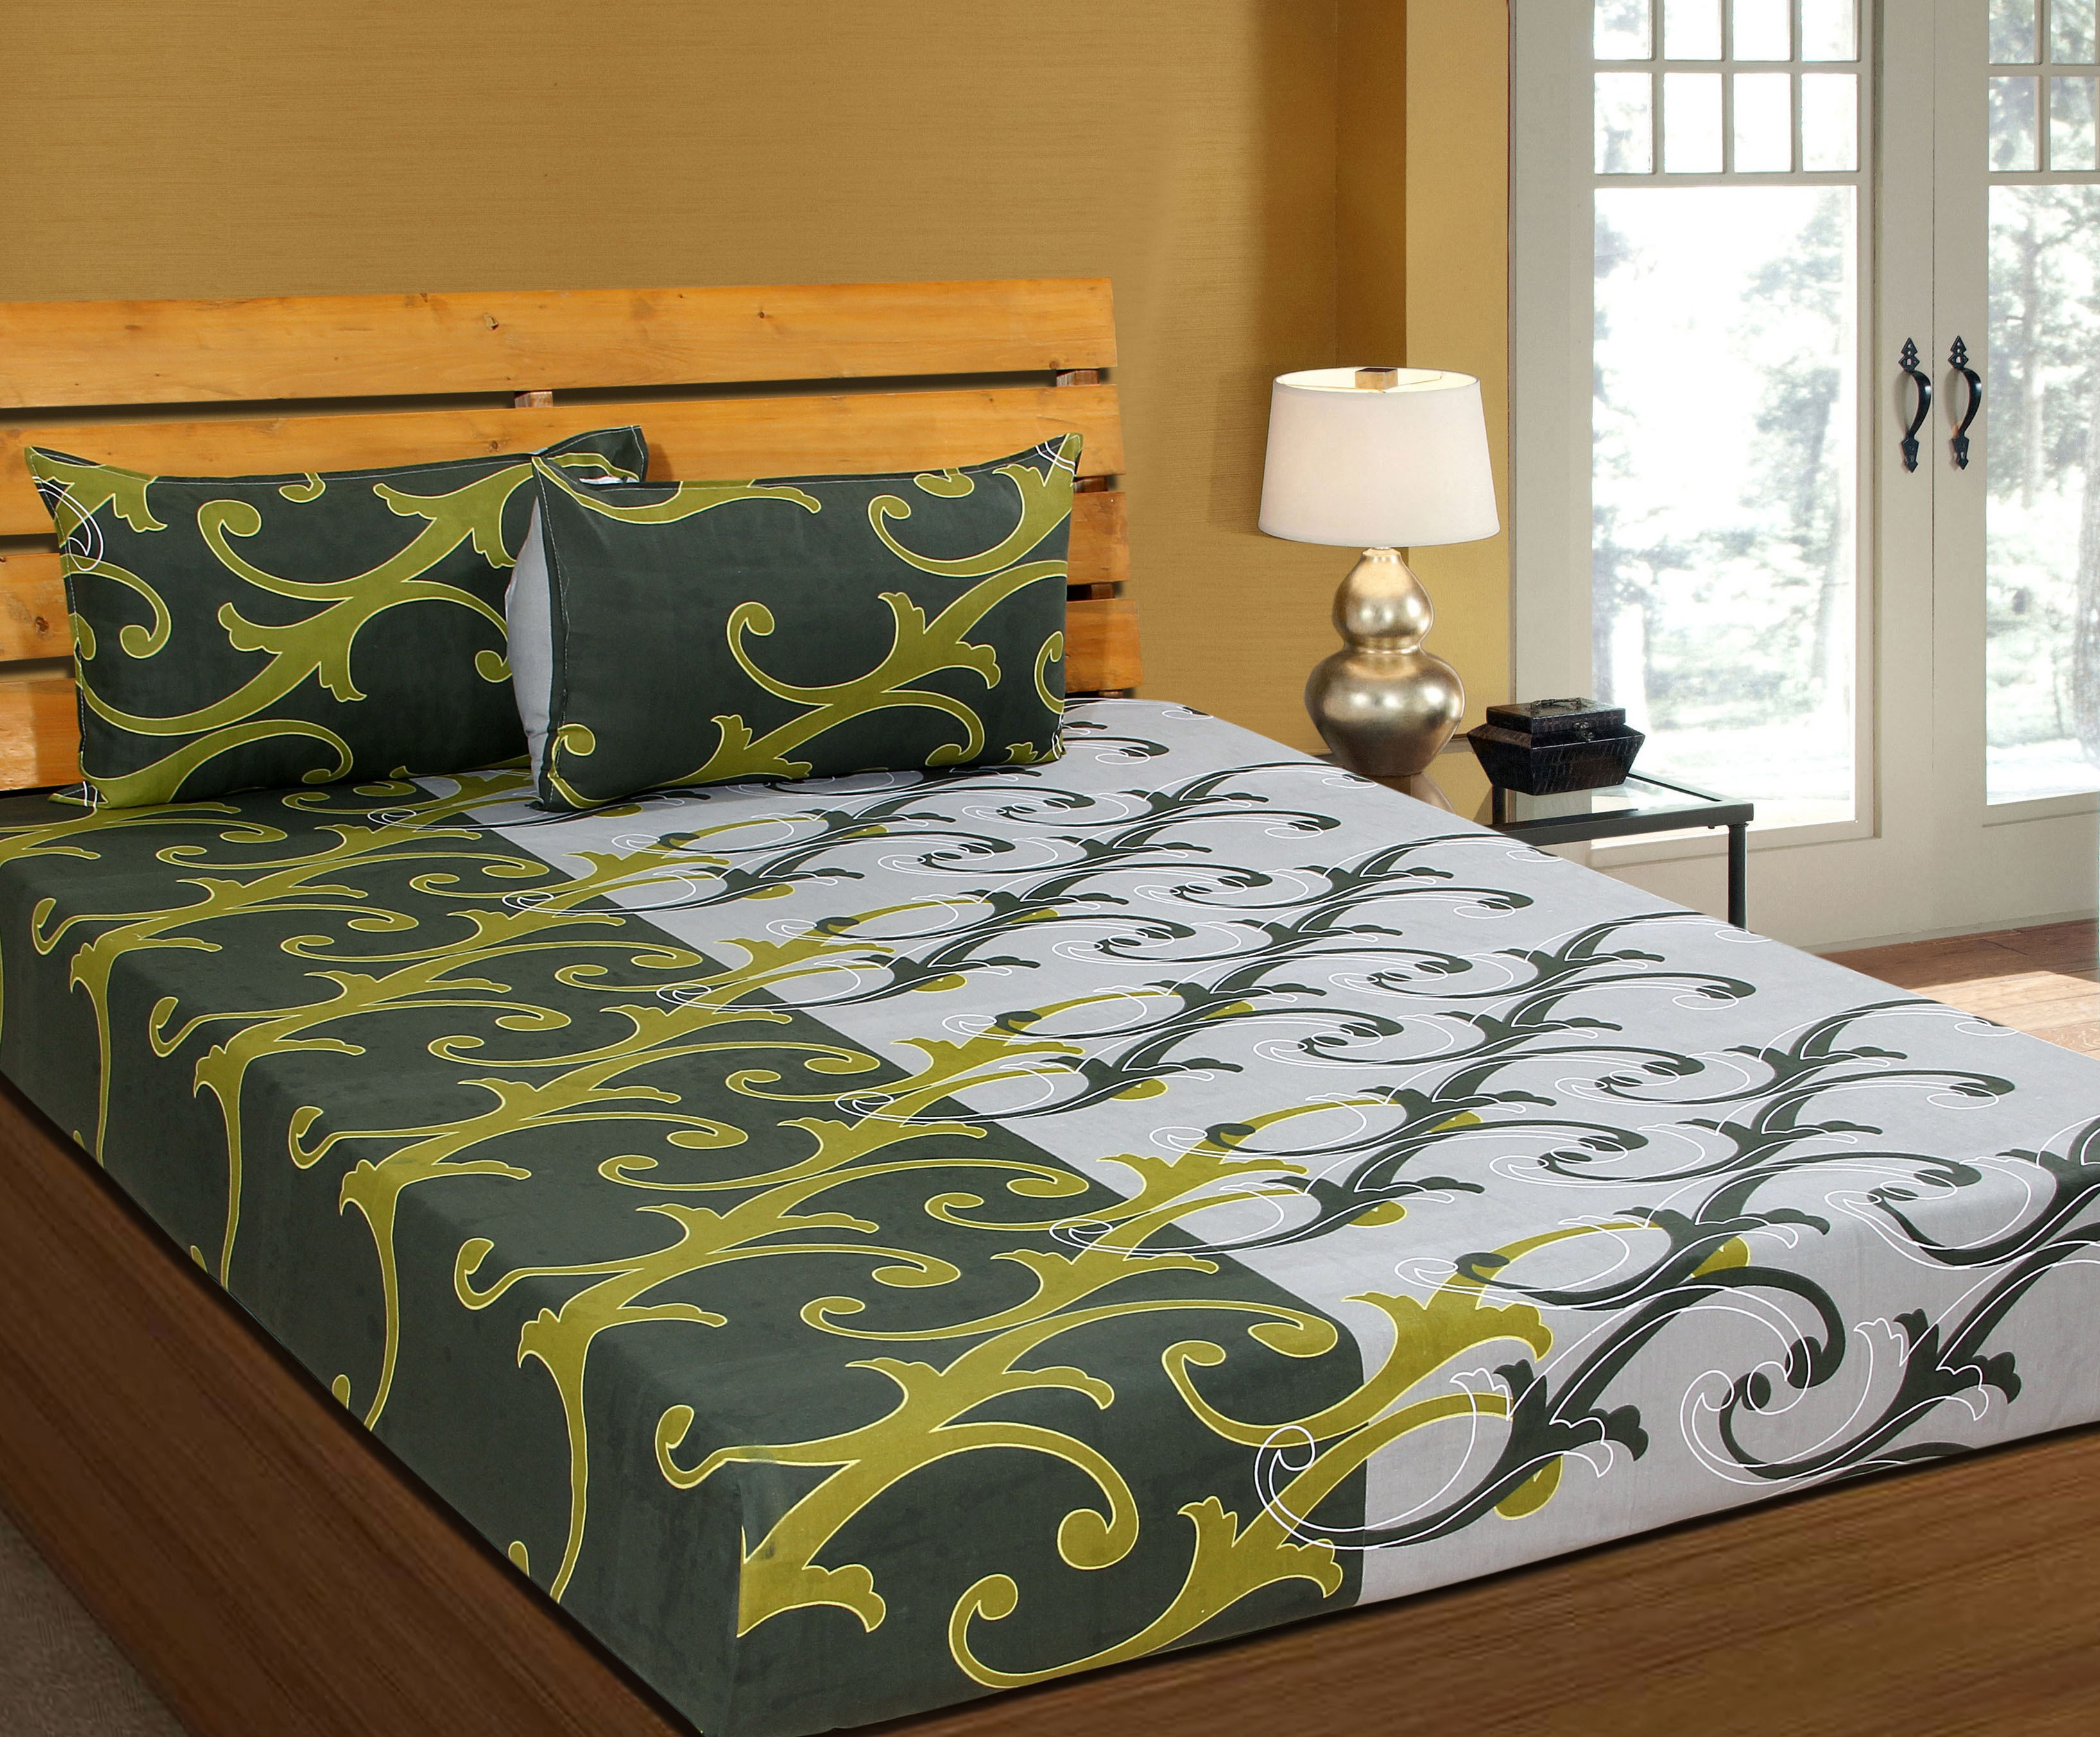 Flipkart - Bedsheets,Curtains & More Under ₹799